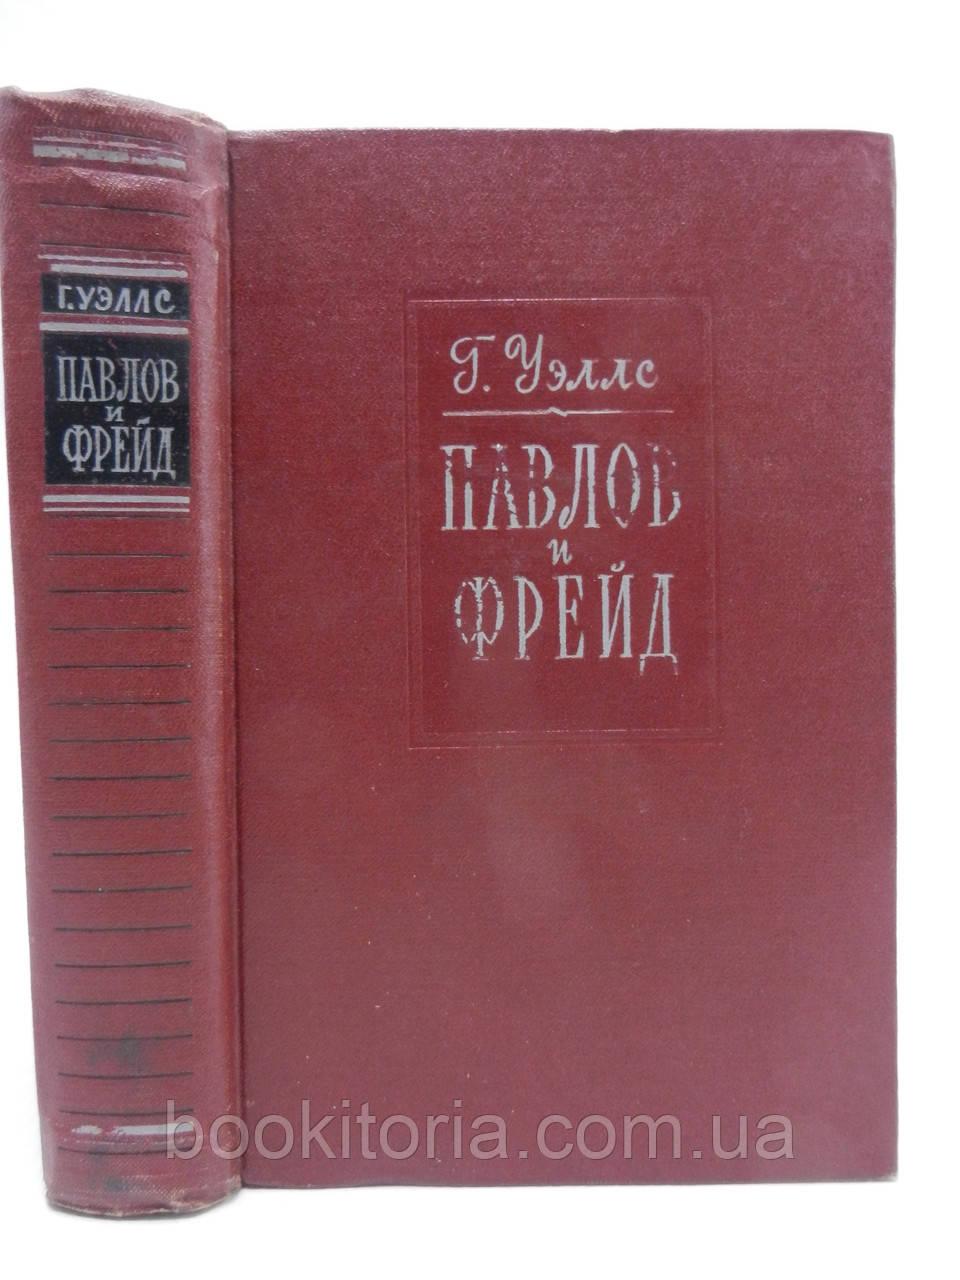 Уэллс Г. Павлов и Фрейд (б/у).